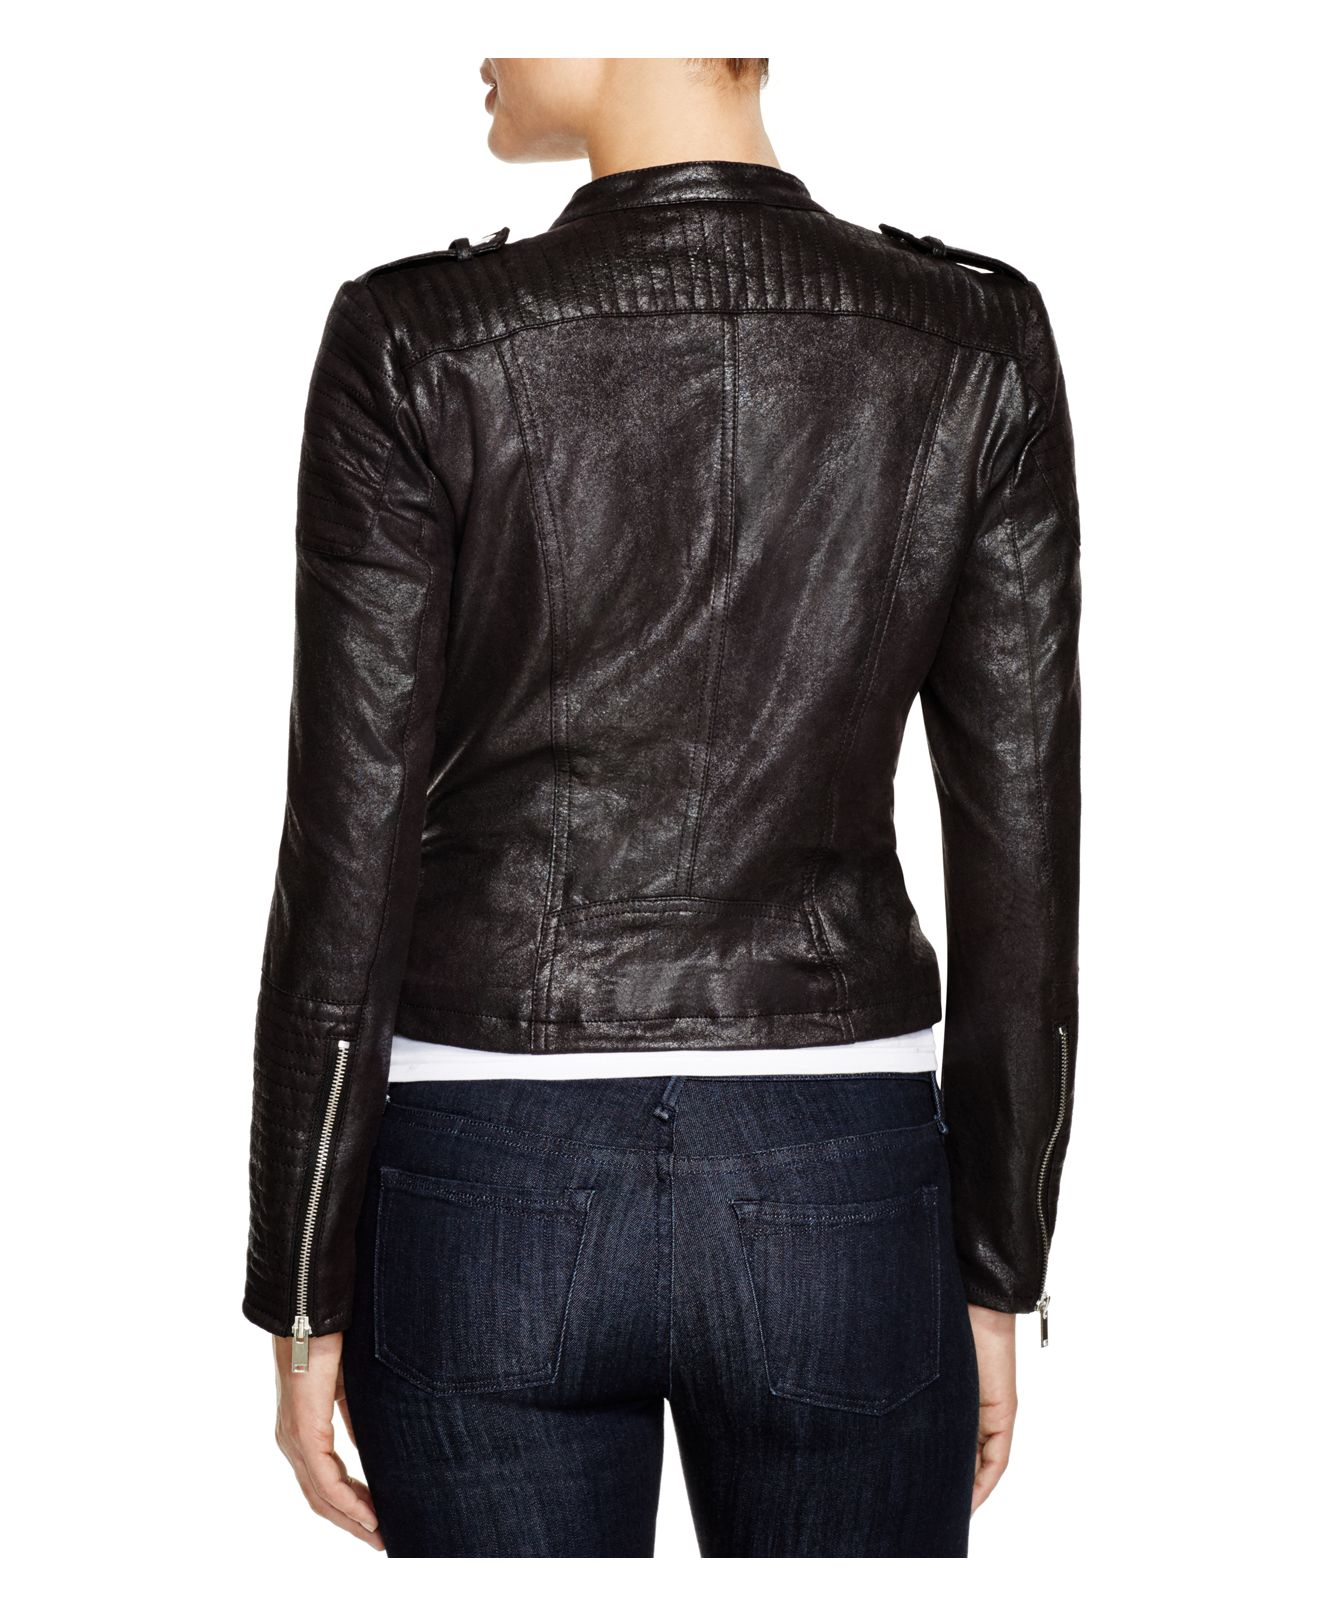 vero moda faux leather moto jacket in black lyst. Black Bedroom Furniture Sets. Home Design Ideas